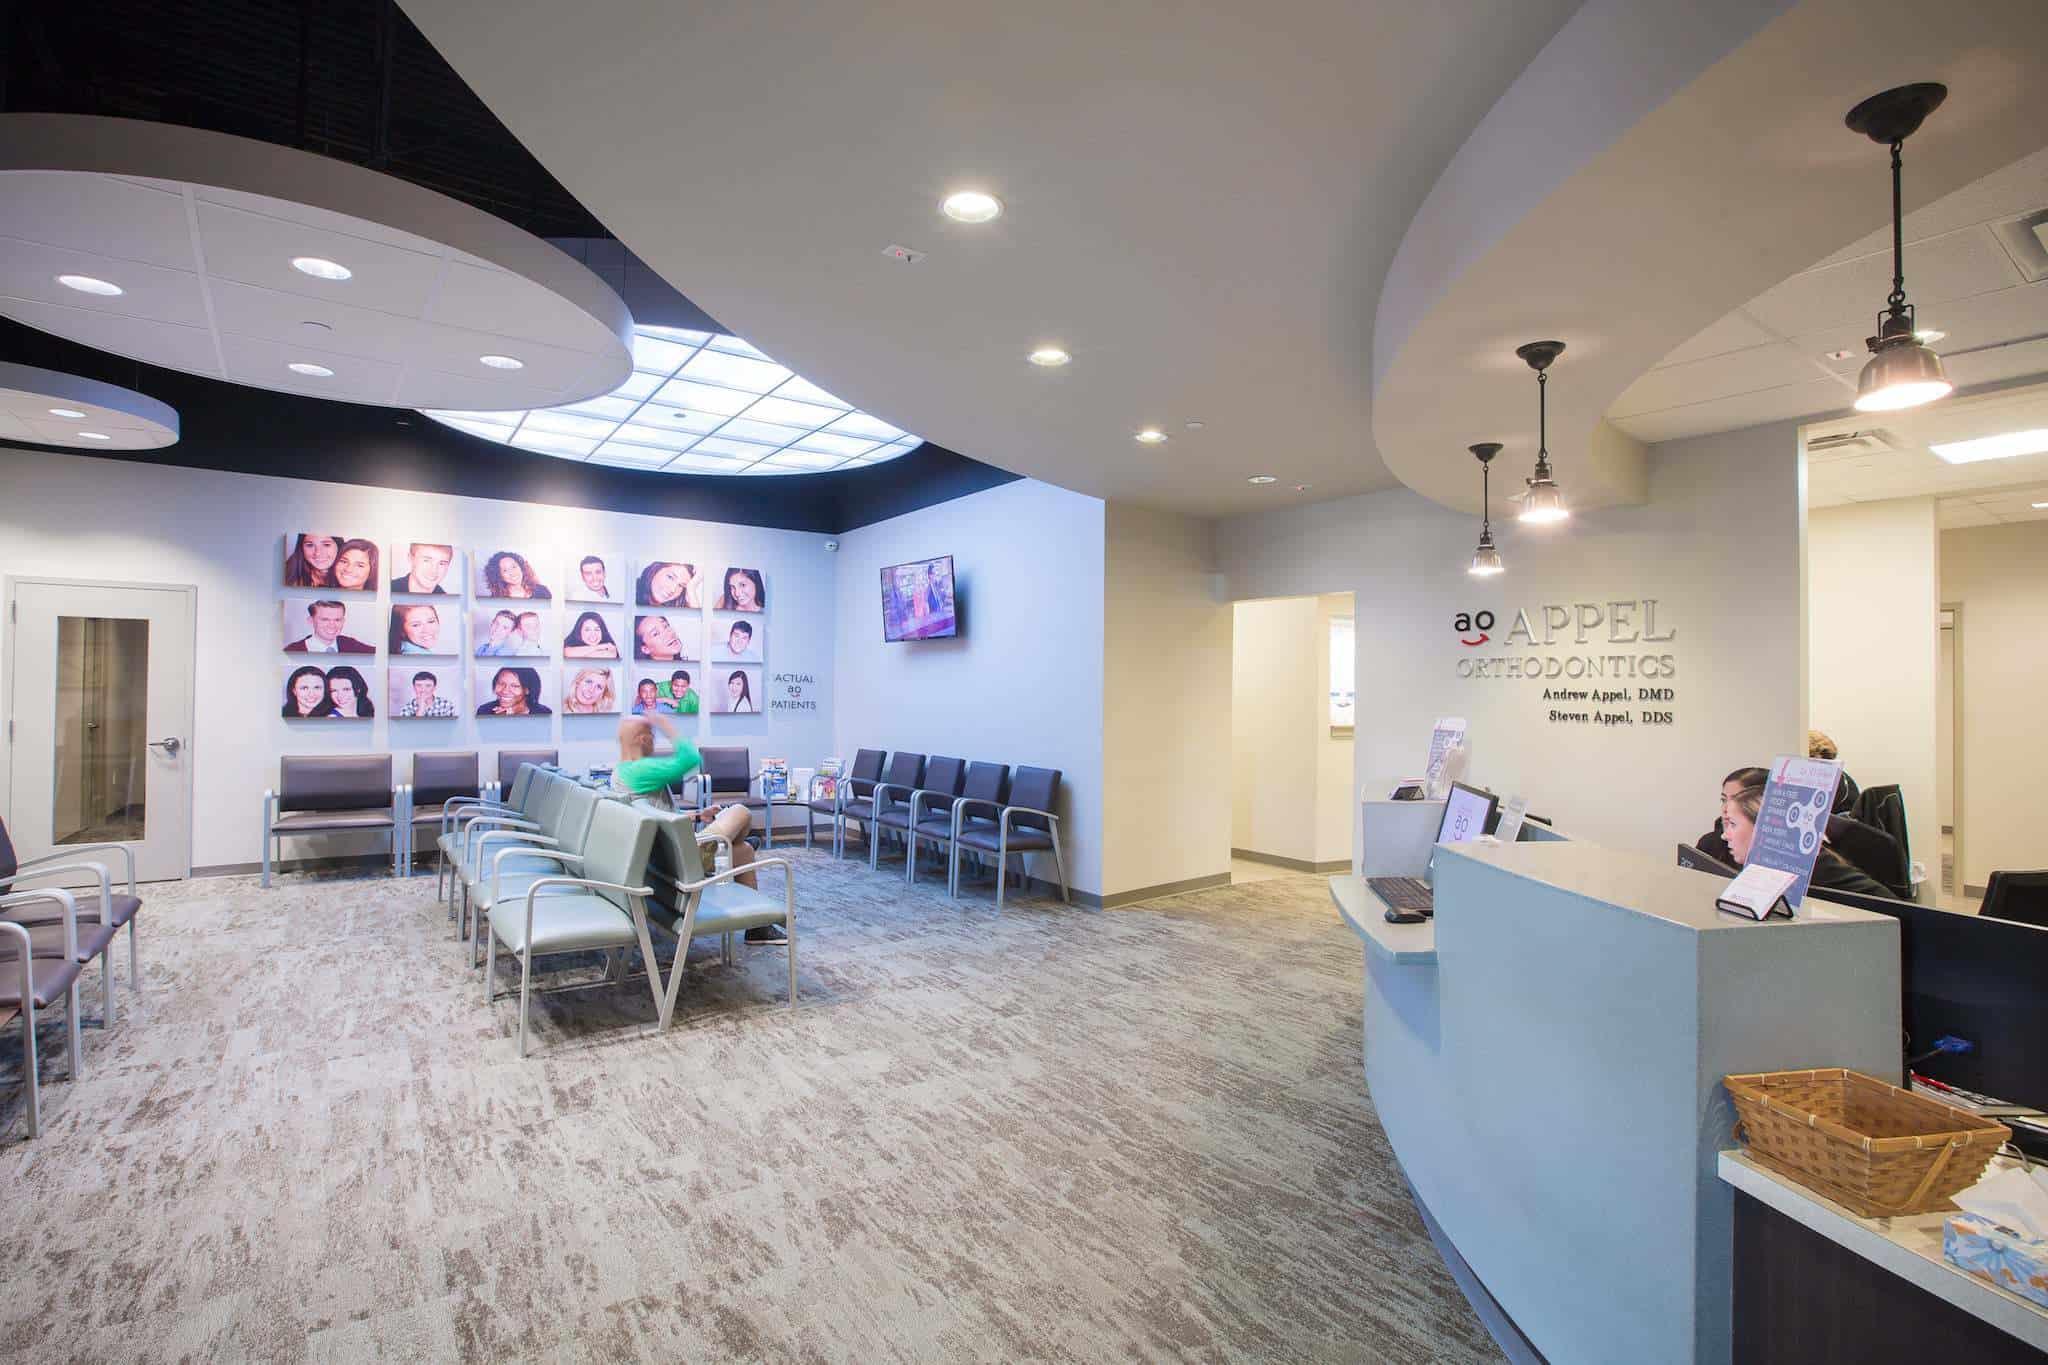 Appel Orthodontics Philadelphia Orthodontics Dr. Appel 52 1 - New Patients